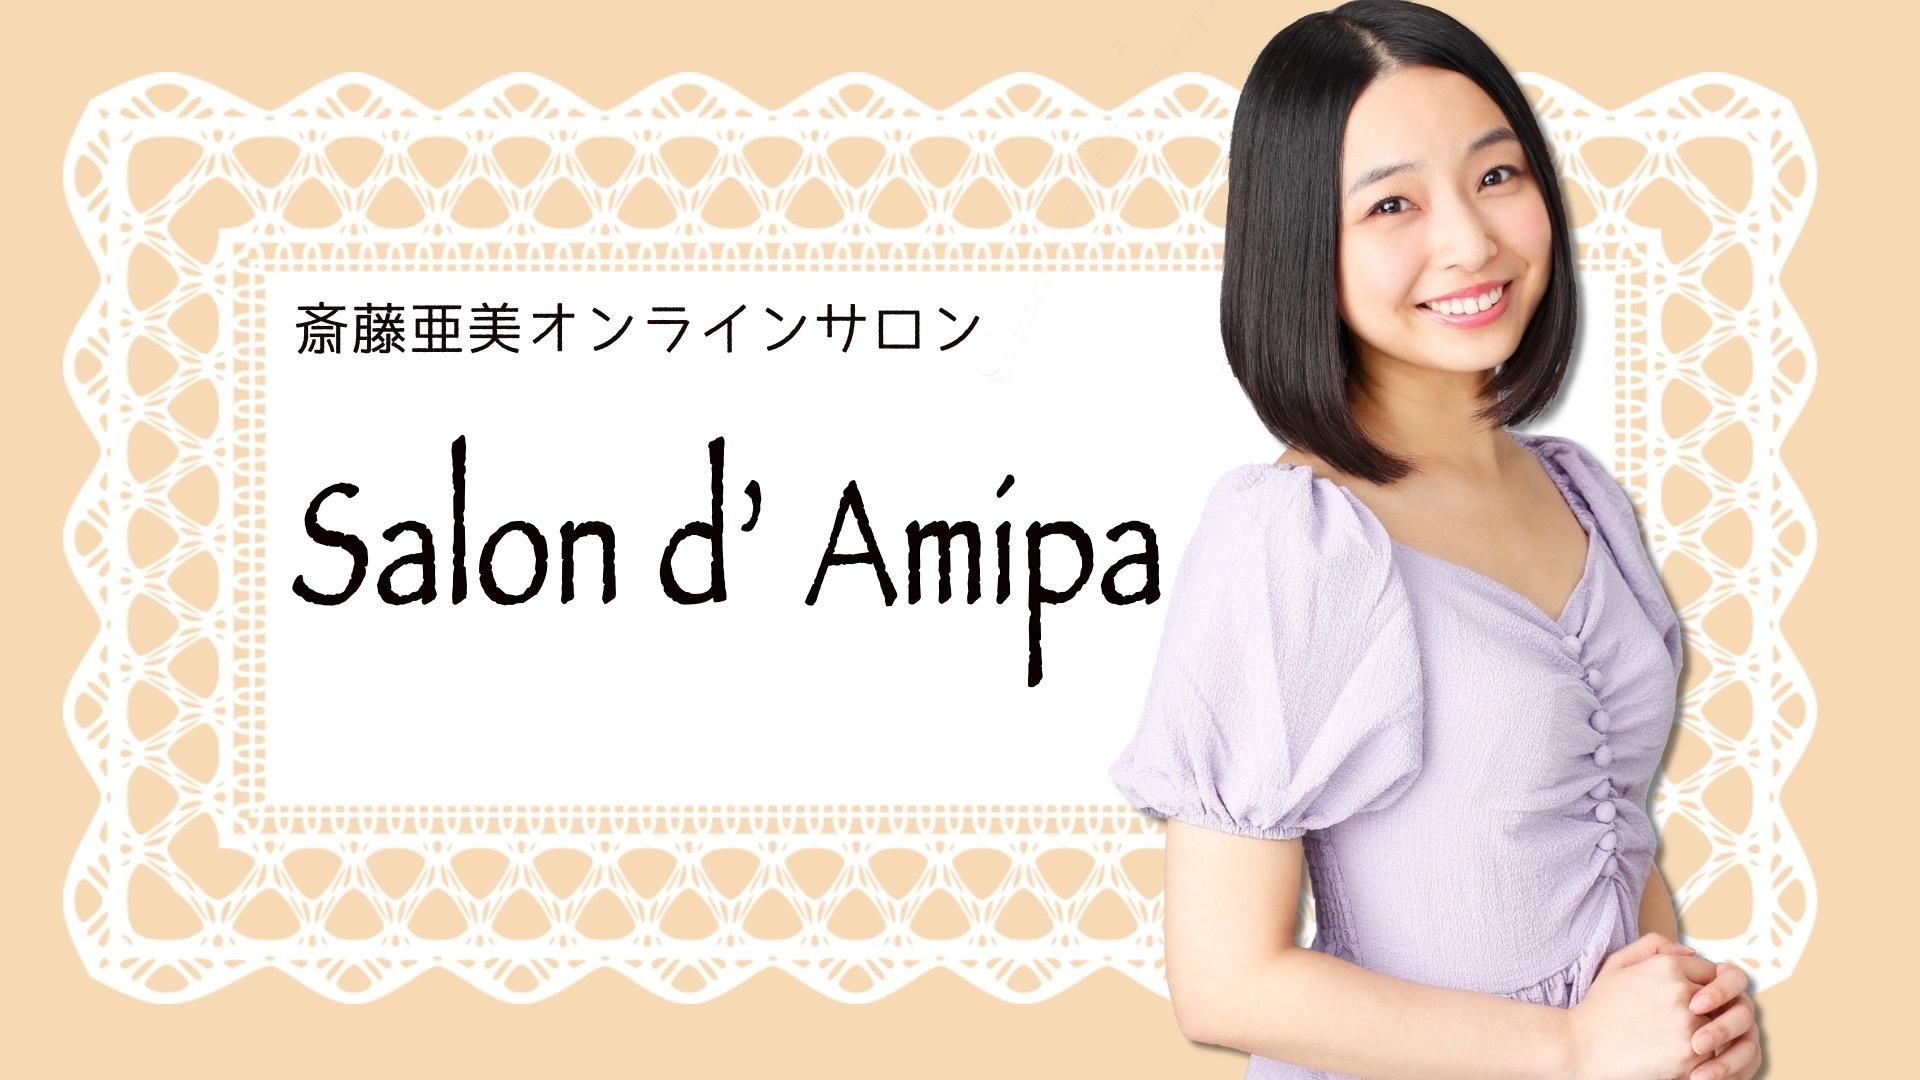 Salon d' Amipa -斎藤亜美オンラインサロン-